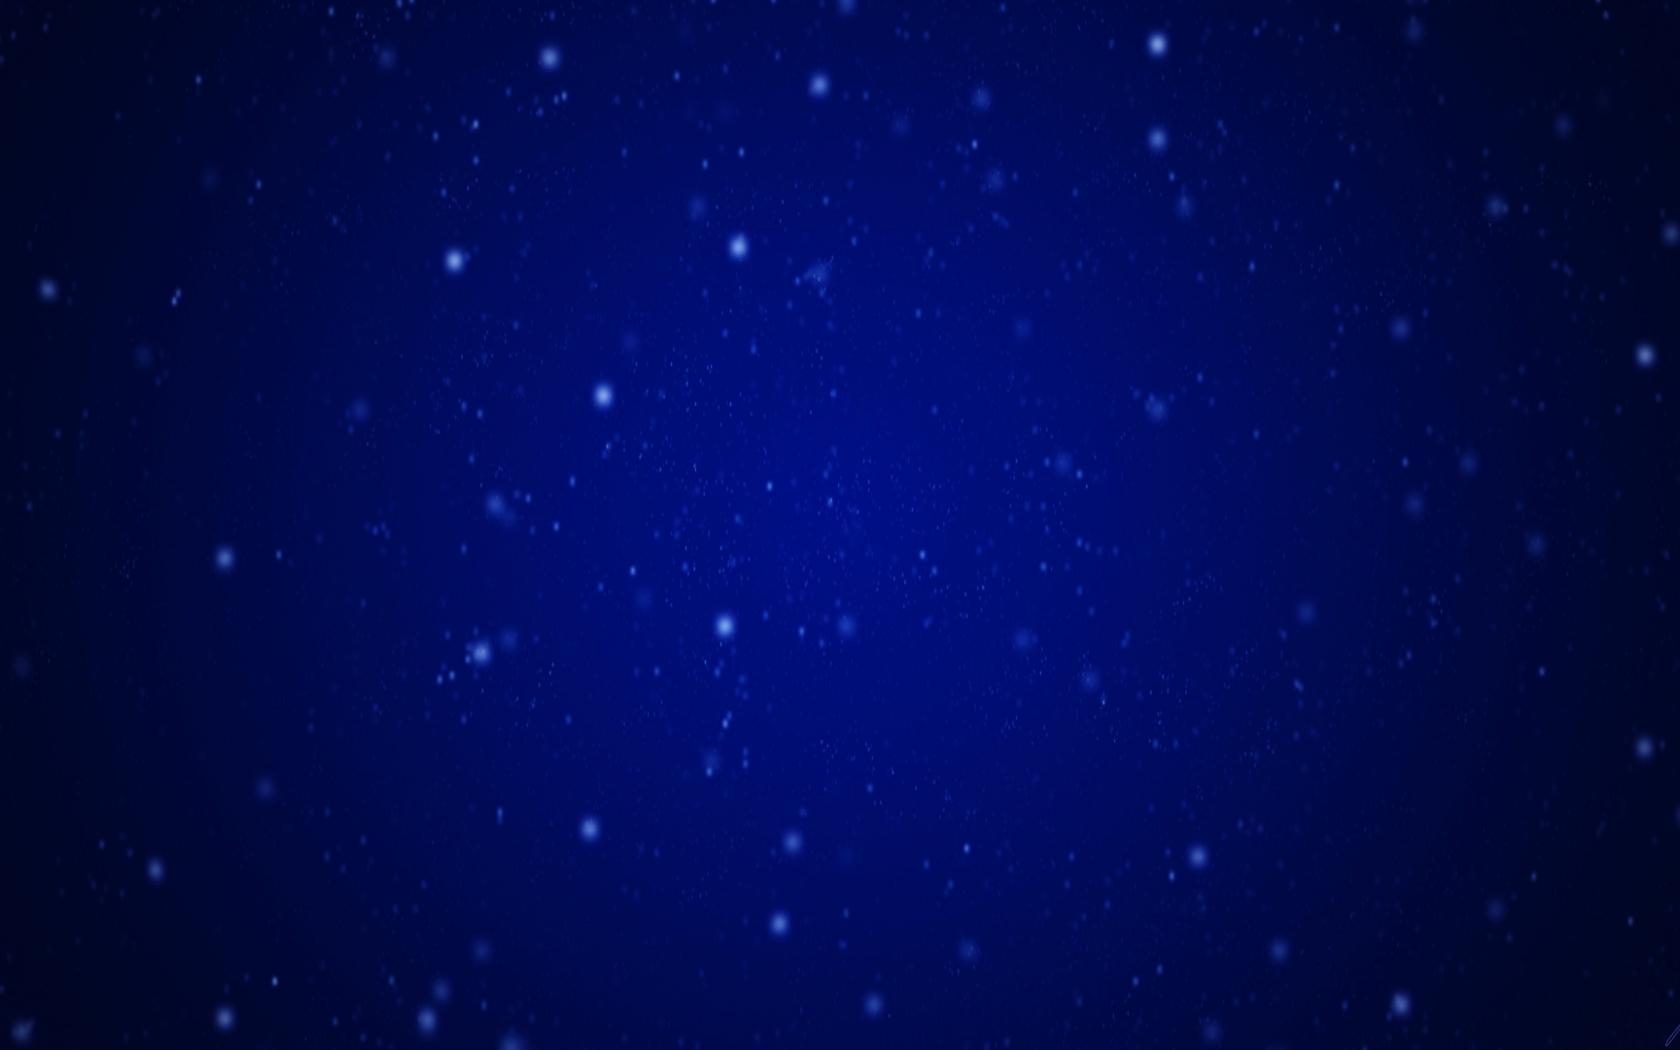 Free Download Dark Blue Color Wallpaper 309614 1920x1080 For